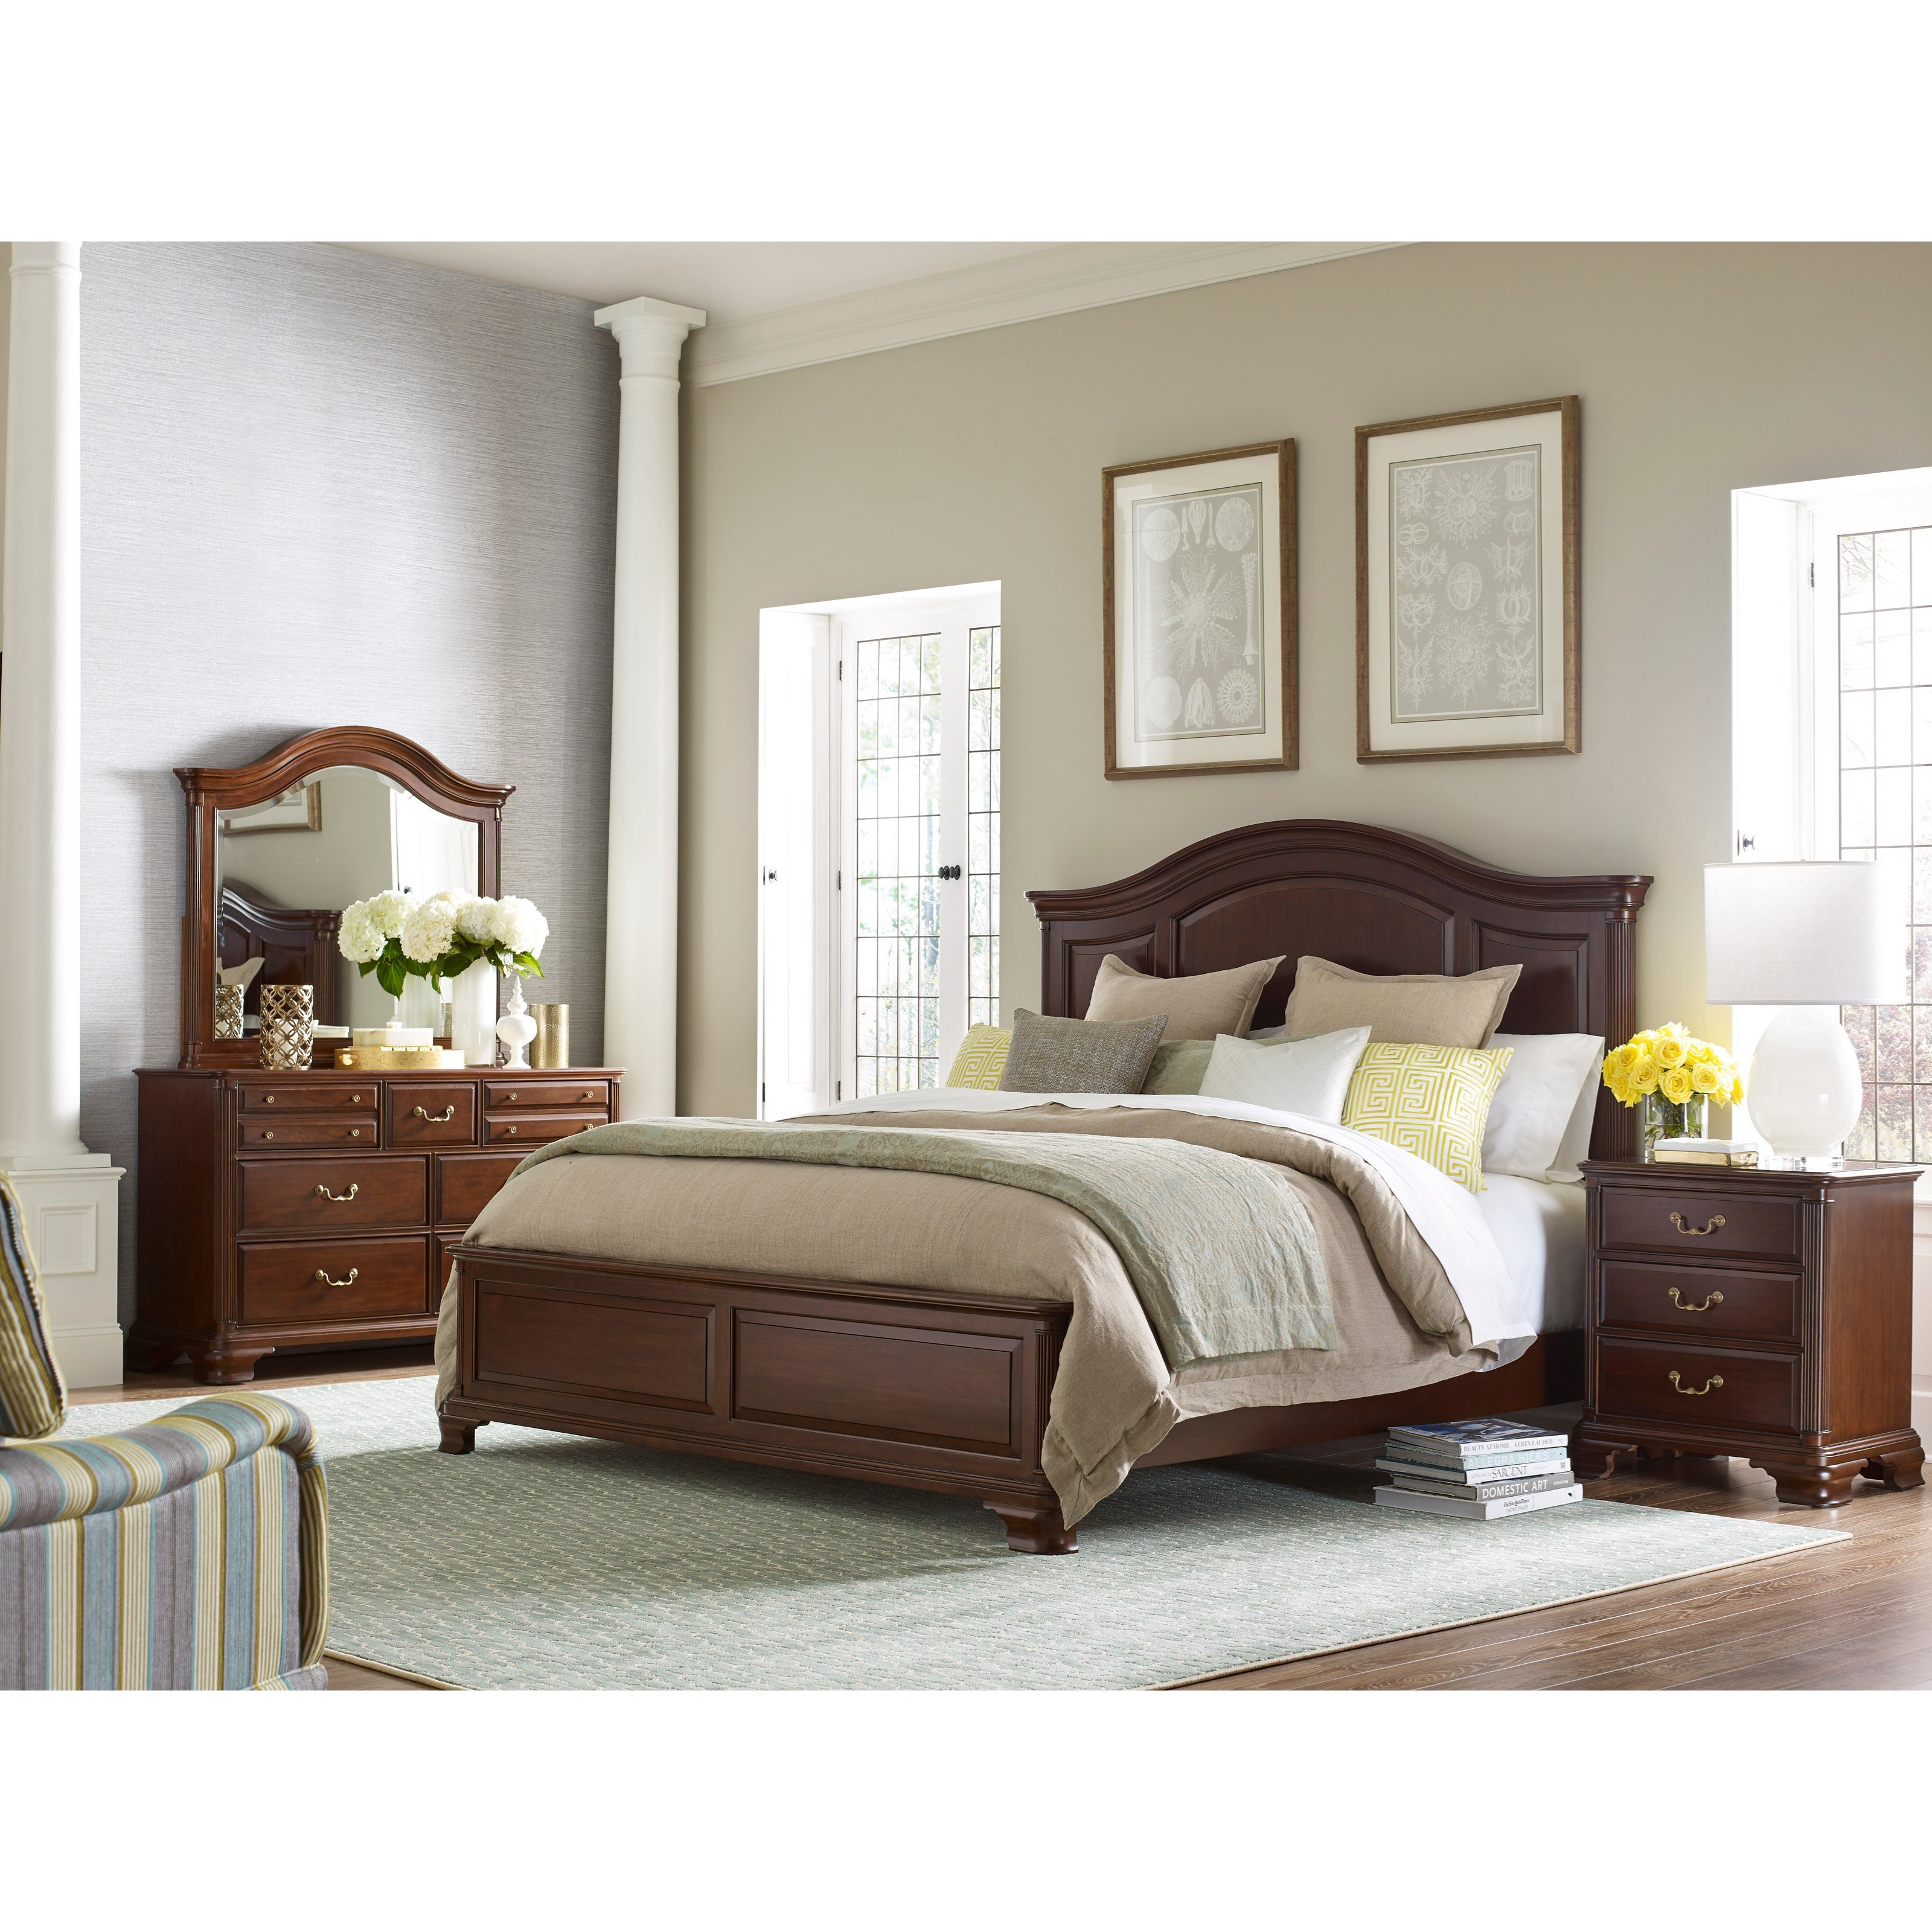 Kincaid Furniture Hadleigh Traditional Three Drawer Nightstand Johnny Janosik Night Stands